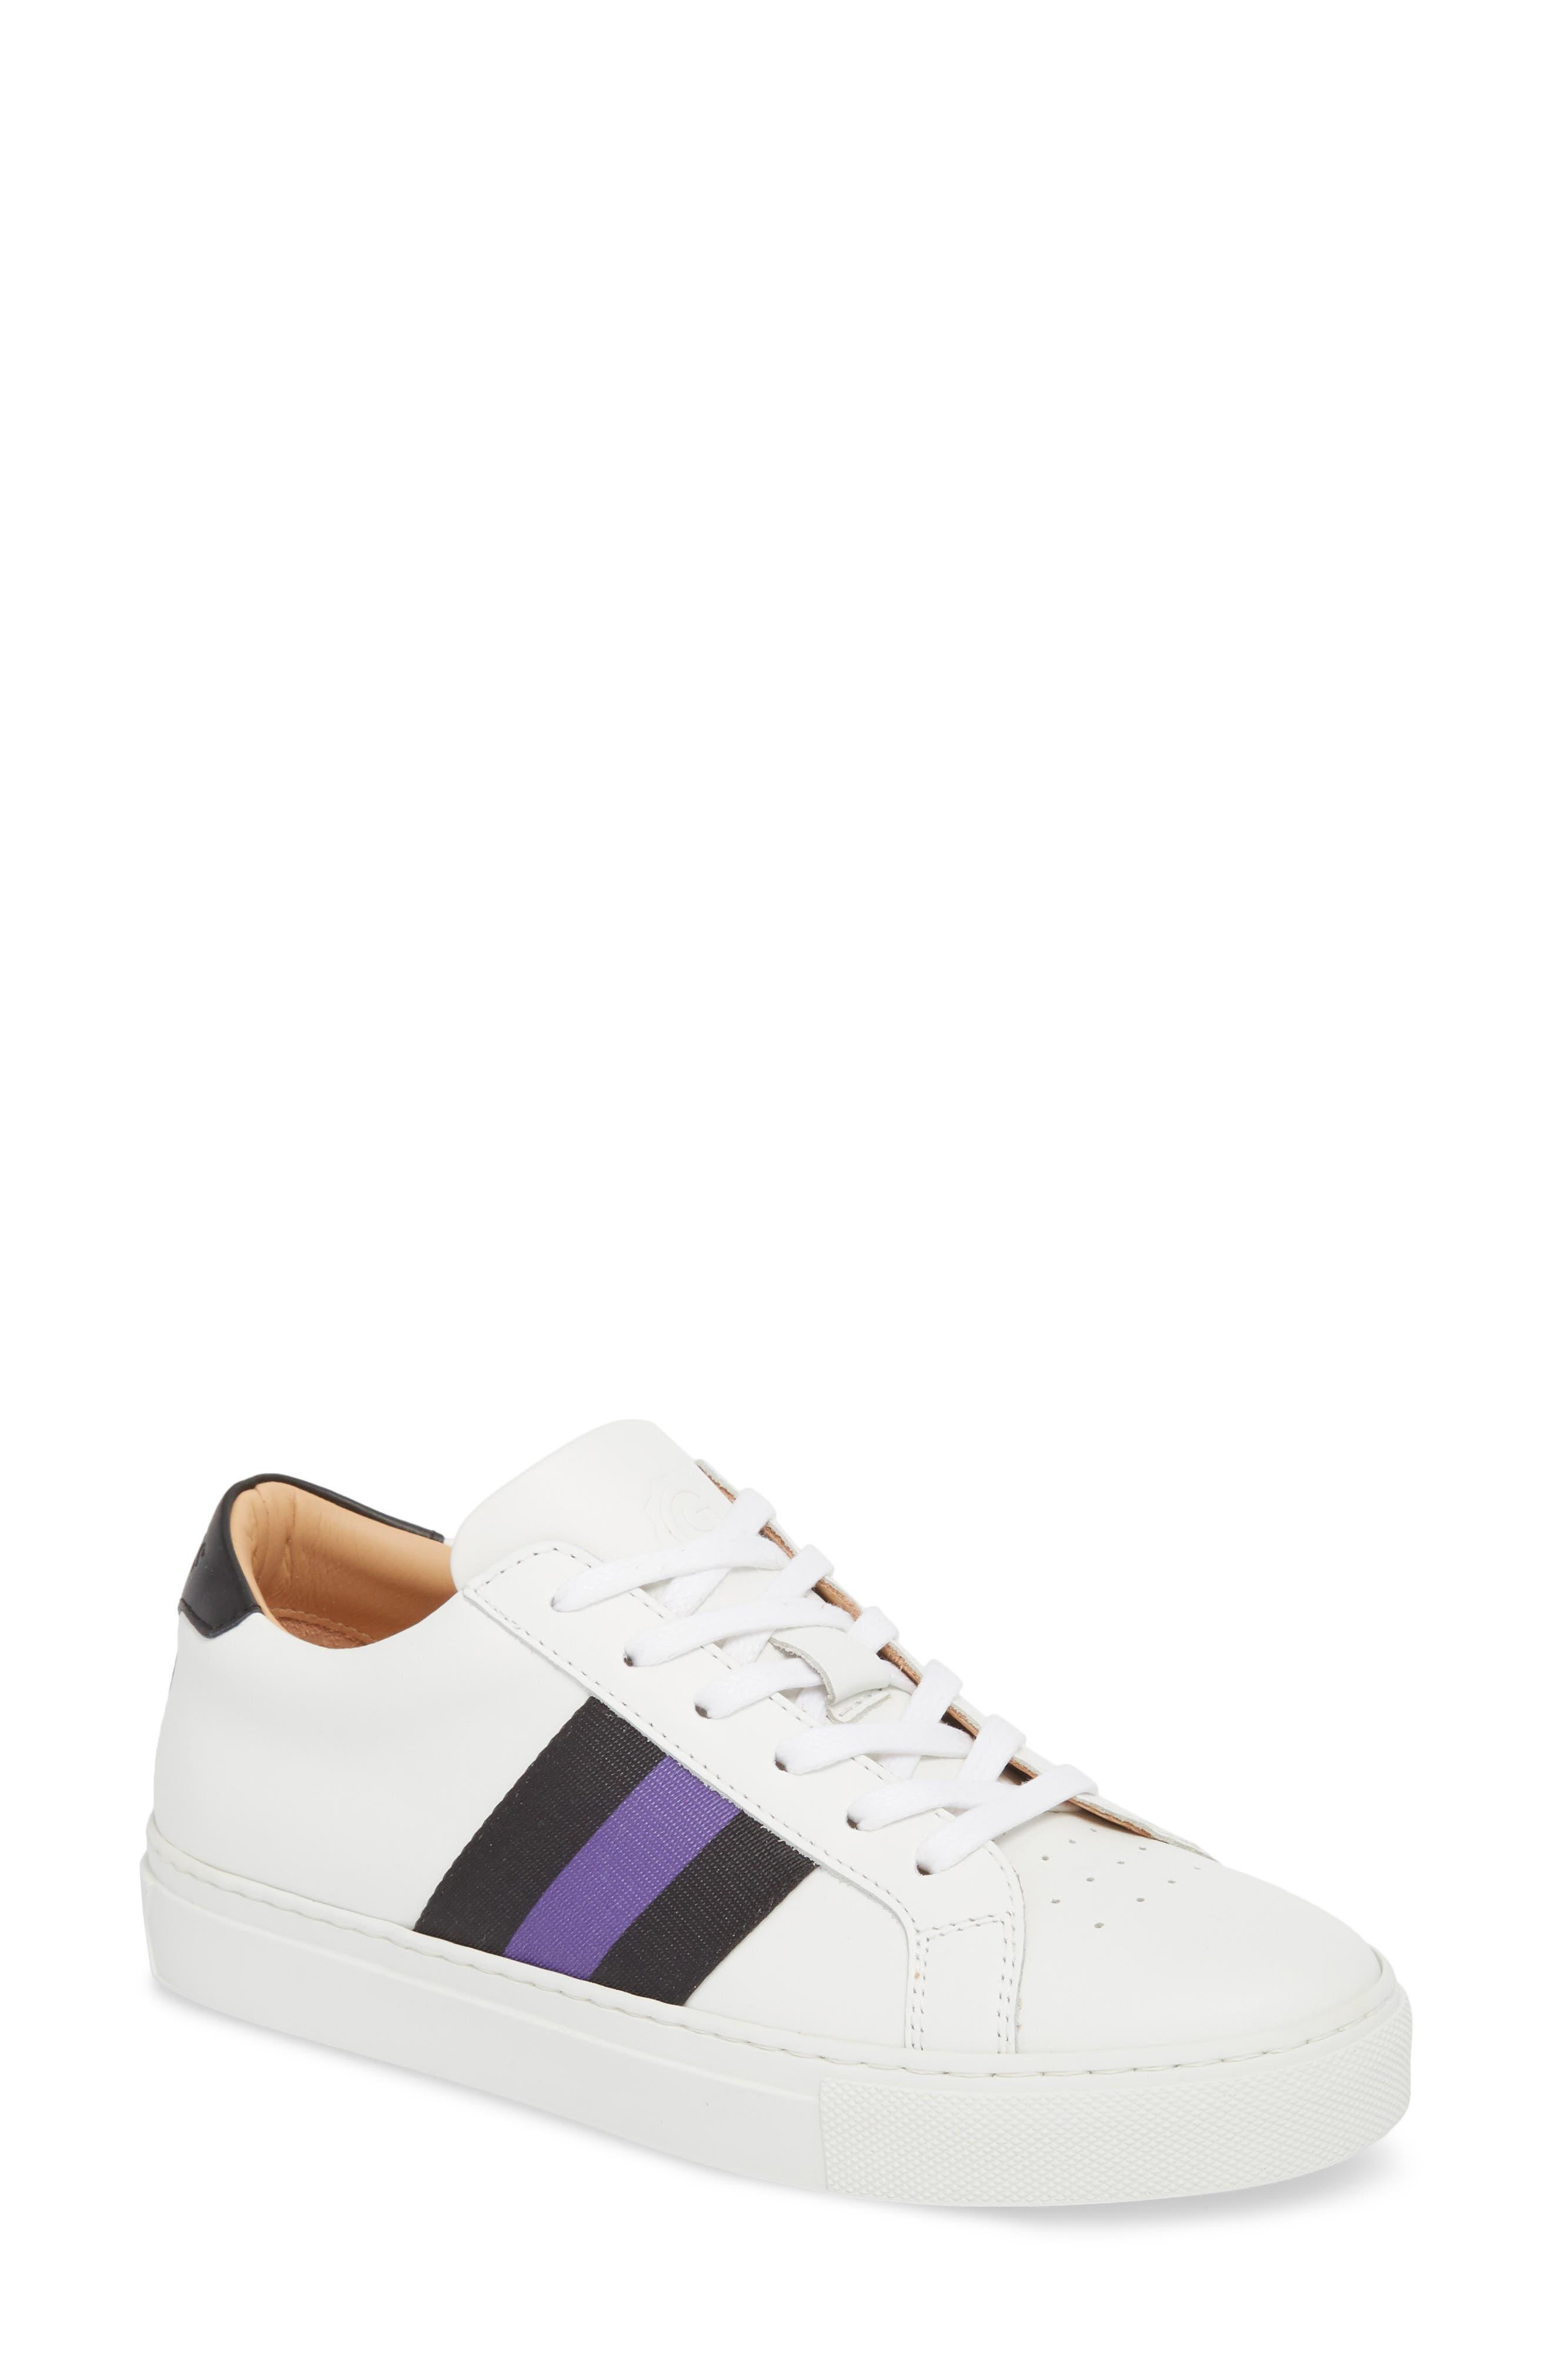 Royale Stripe Sneaker,                         Main,                         color, WHITE/ BLACK/ VIOLET